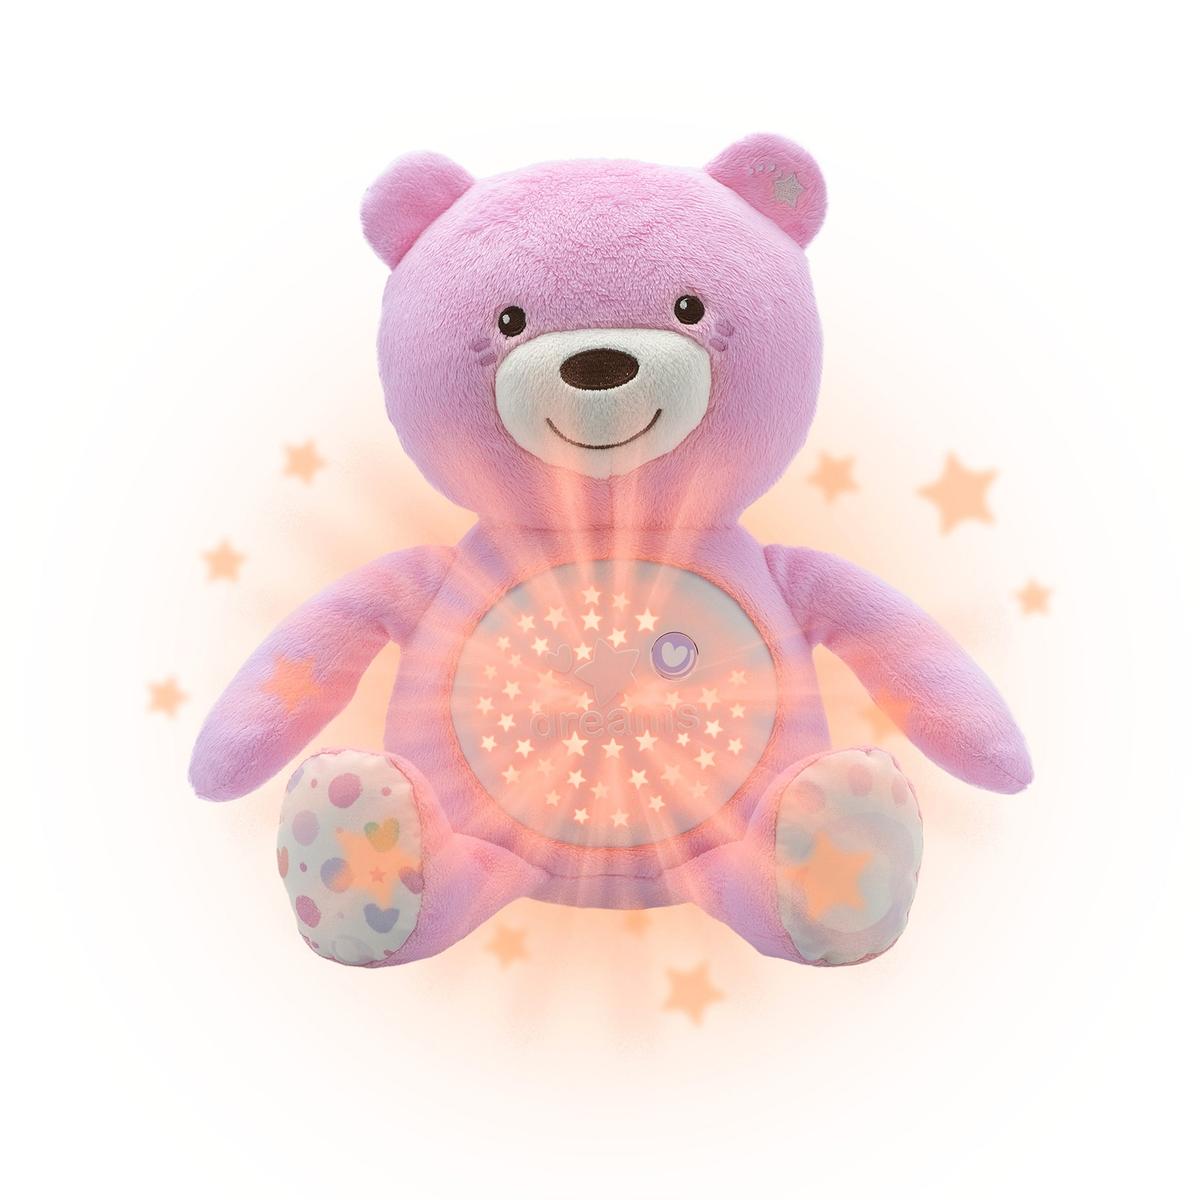 Orso proiettore Baby Bear, rosa